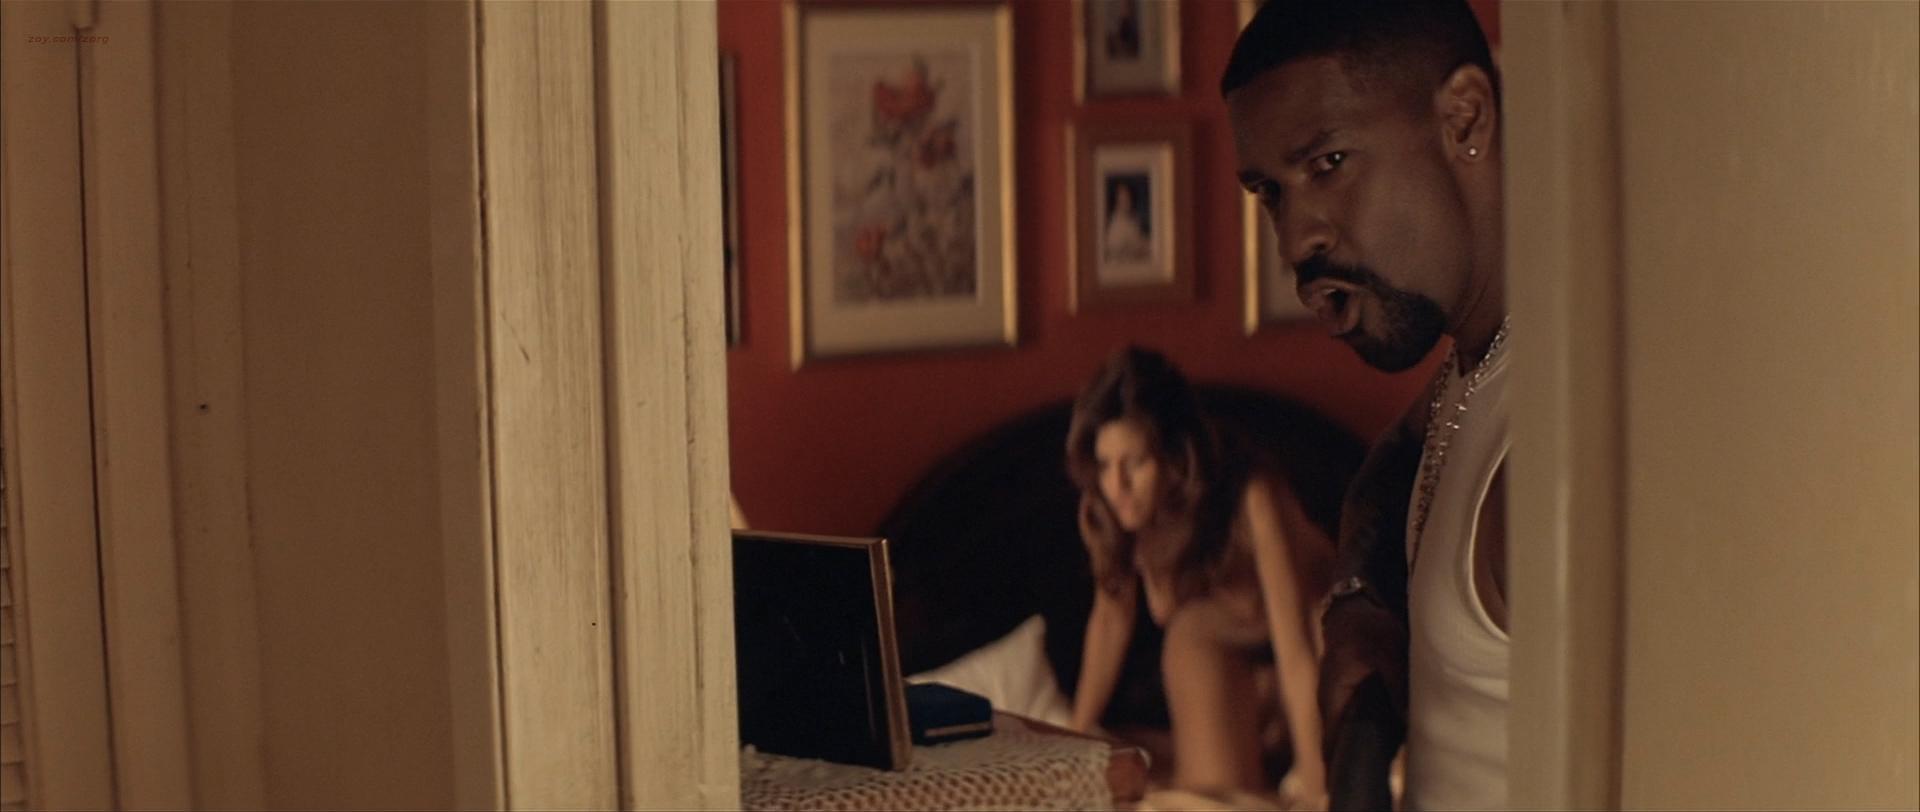 eva-mendez-full-frontal-nudity-hentai-juicy-pussy-movies